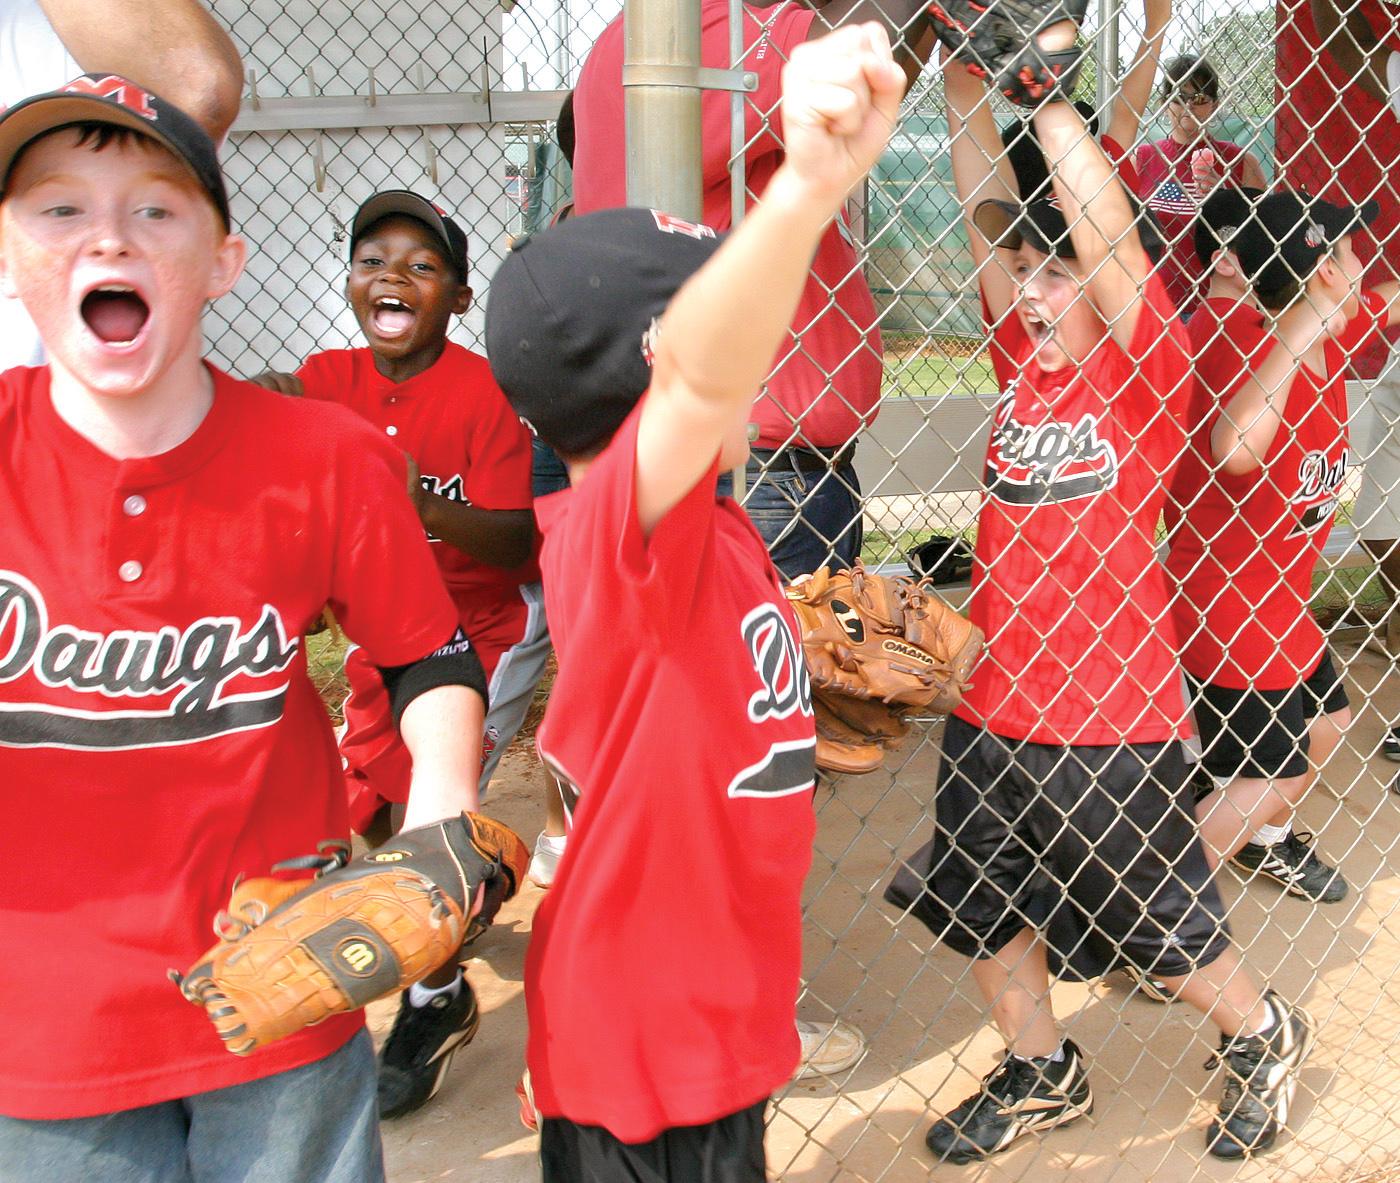 Little League baseball team